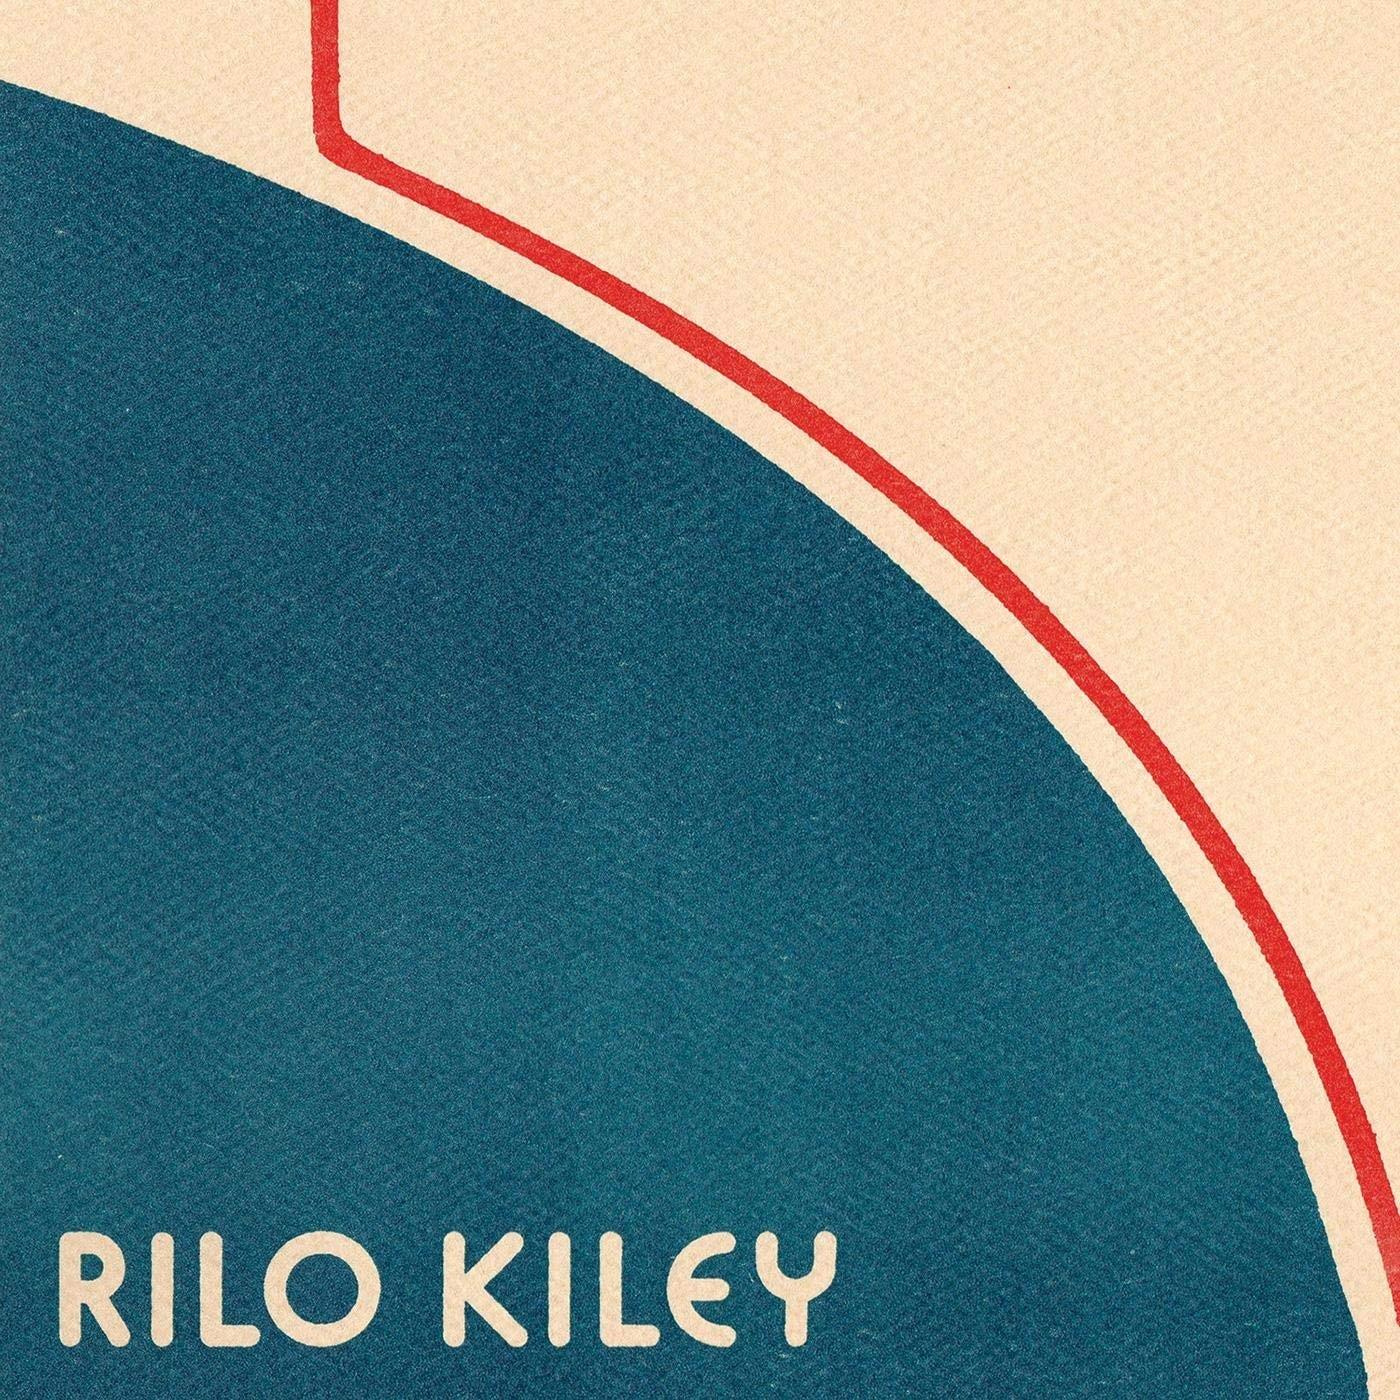 Rilo Kiley - Rilo Kiley (Colored) LP